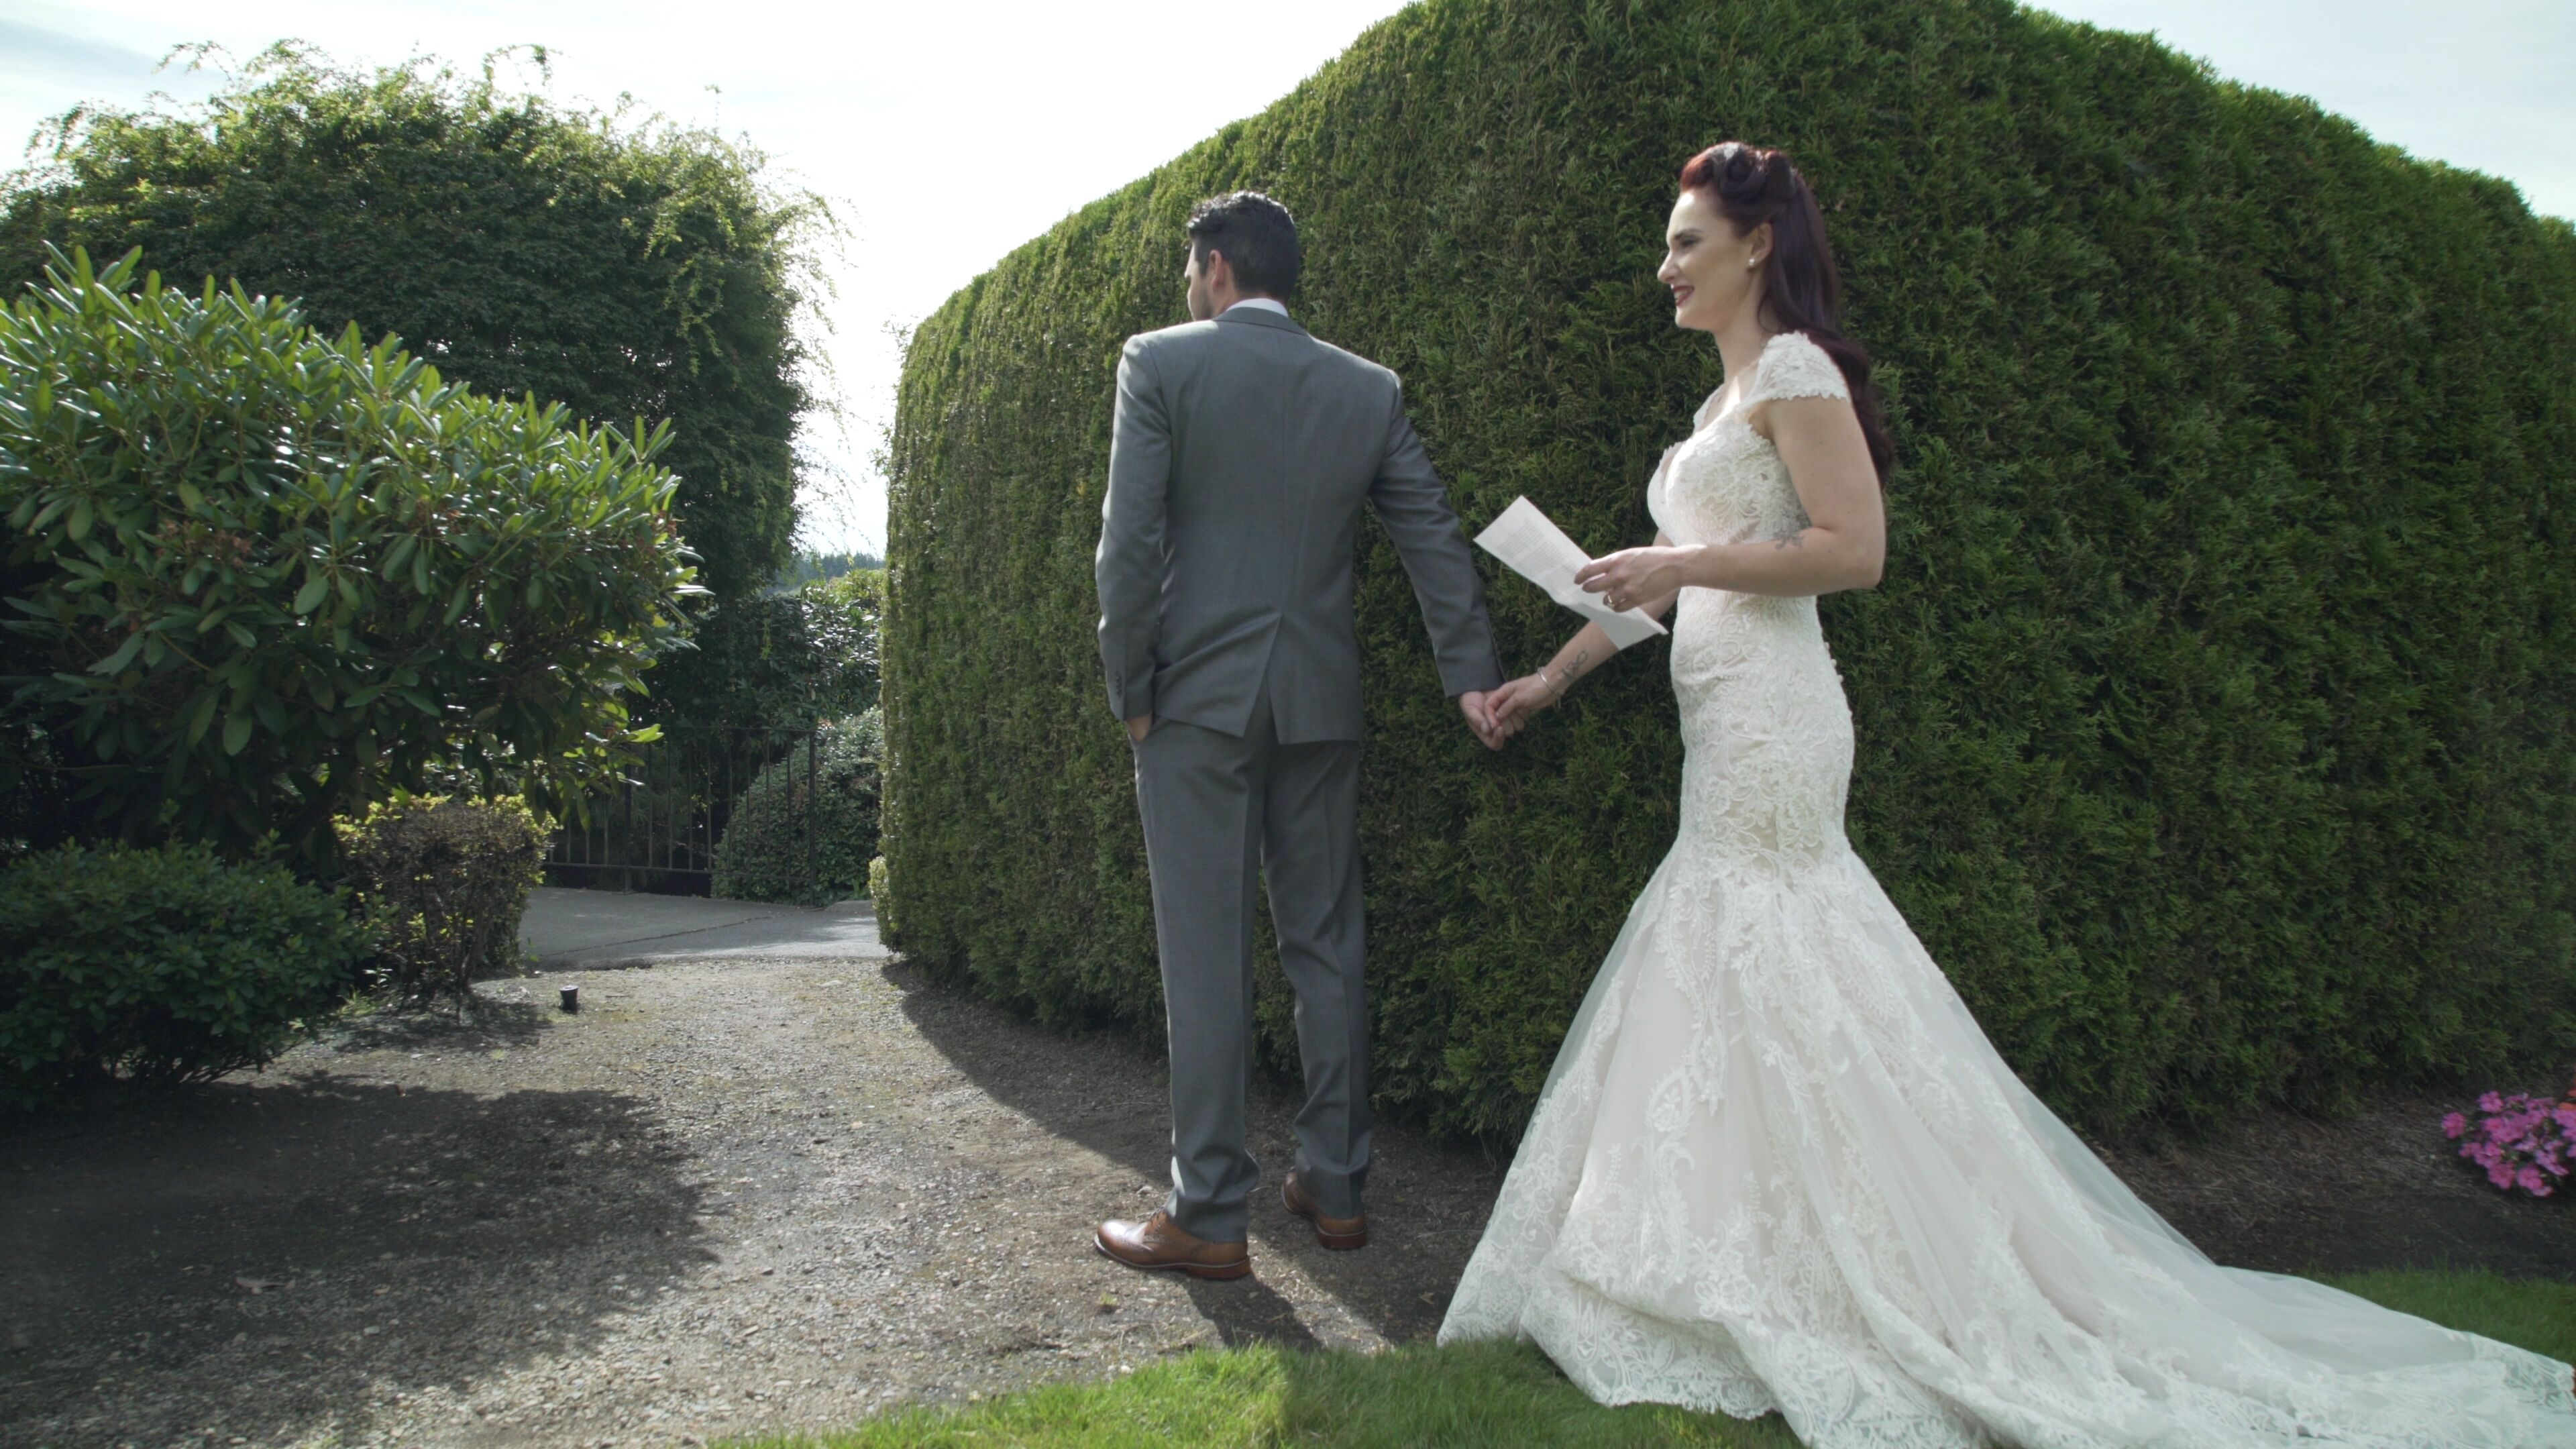 Wedding Videographers in Yuma, AZ   The Knot